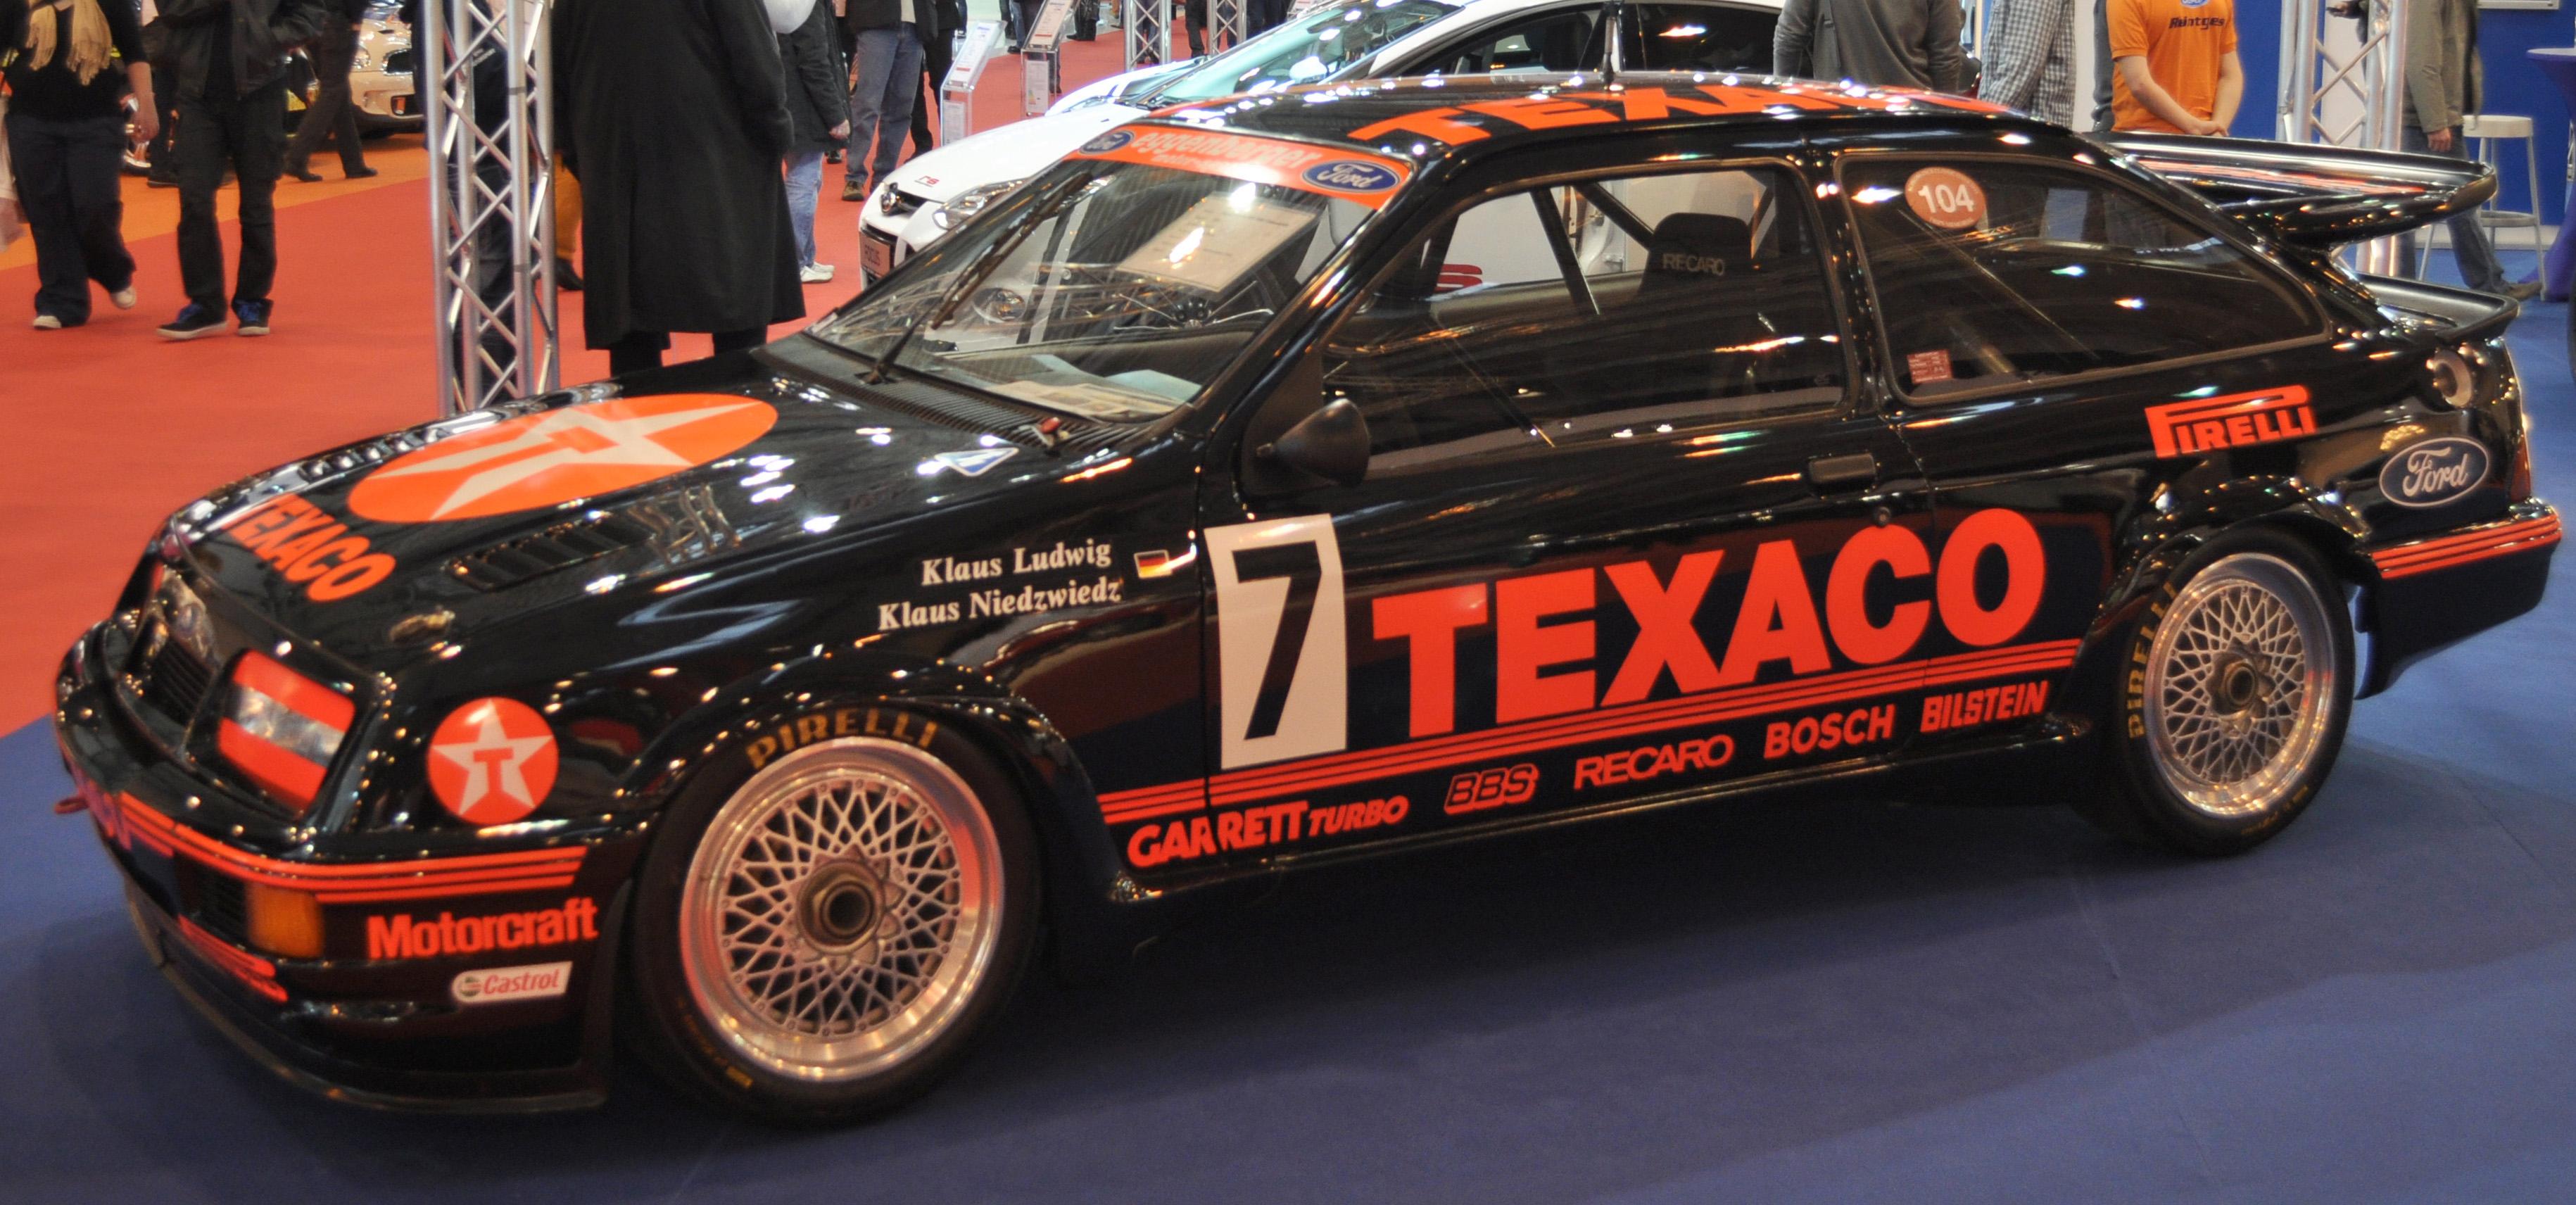 American Car Racing Big Brand